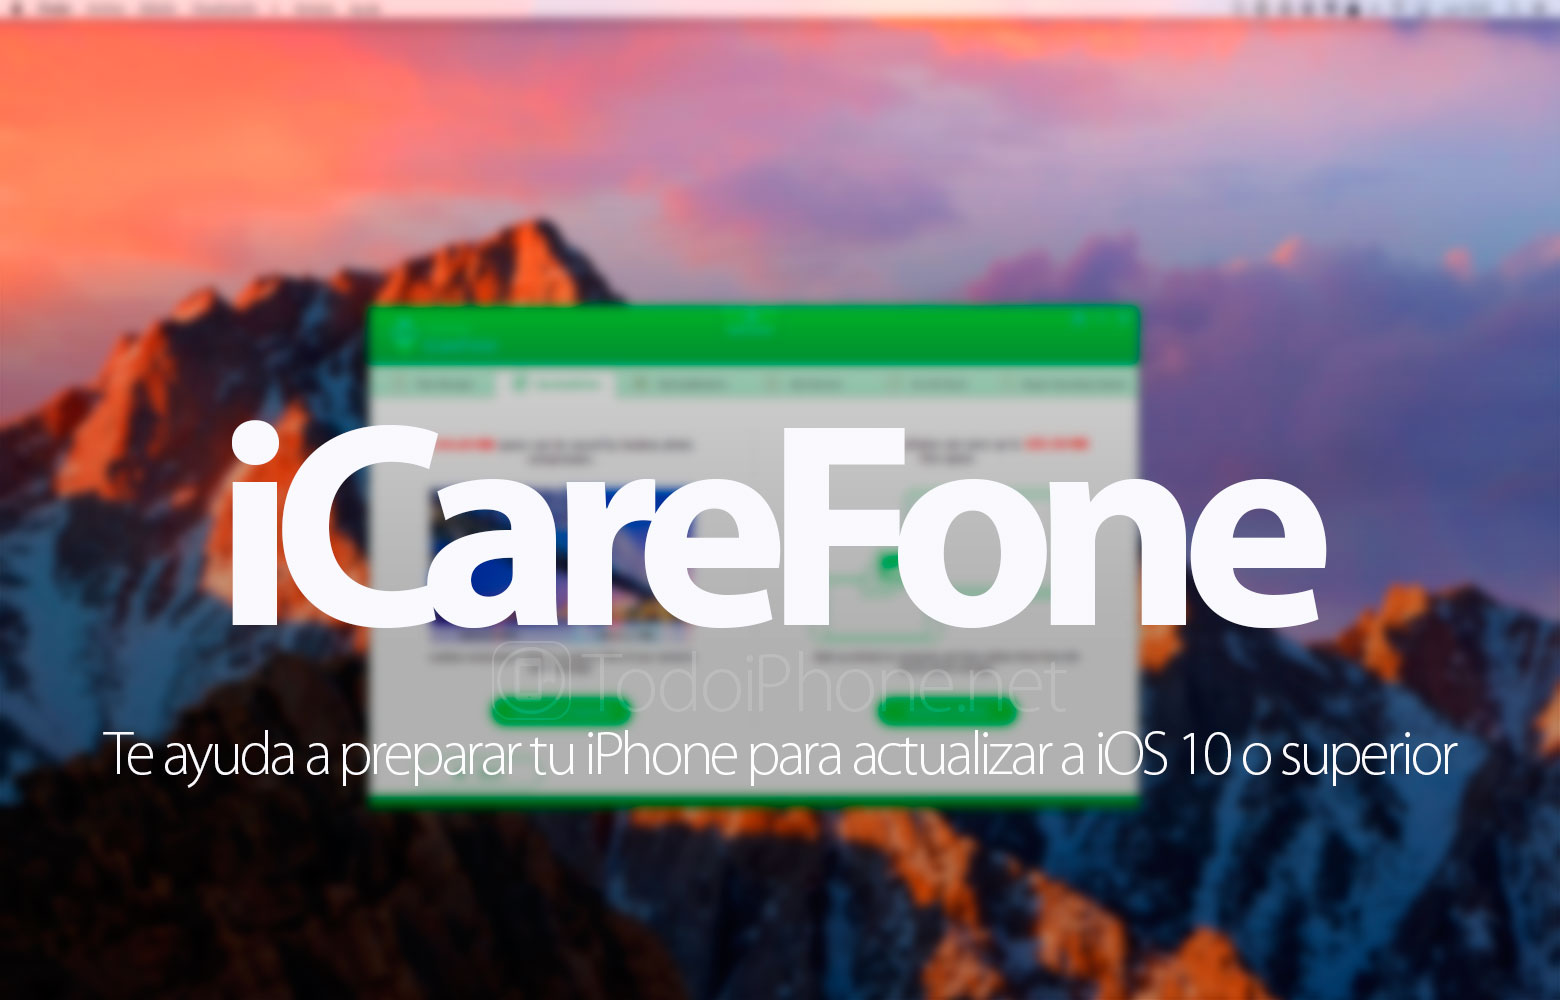 preparar-iphone-actualizar-ios-10-icarefone